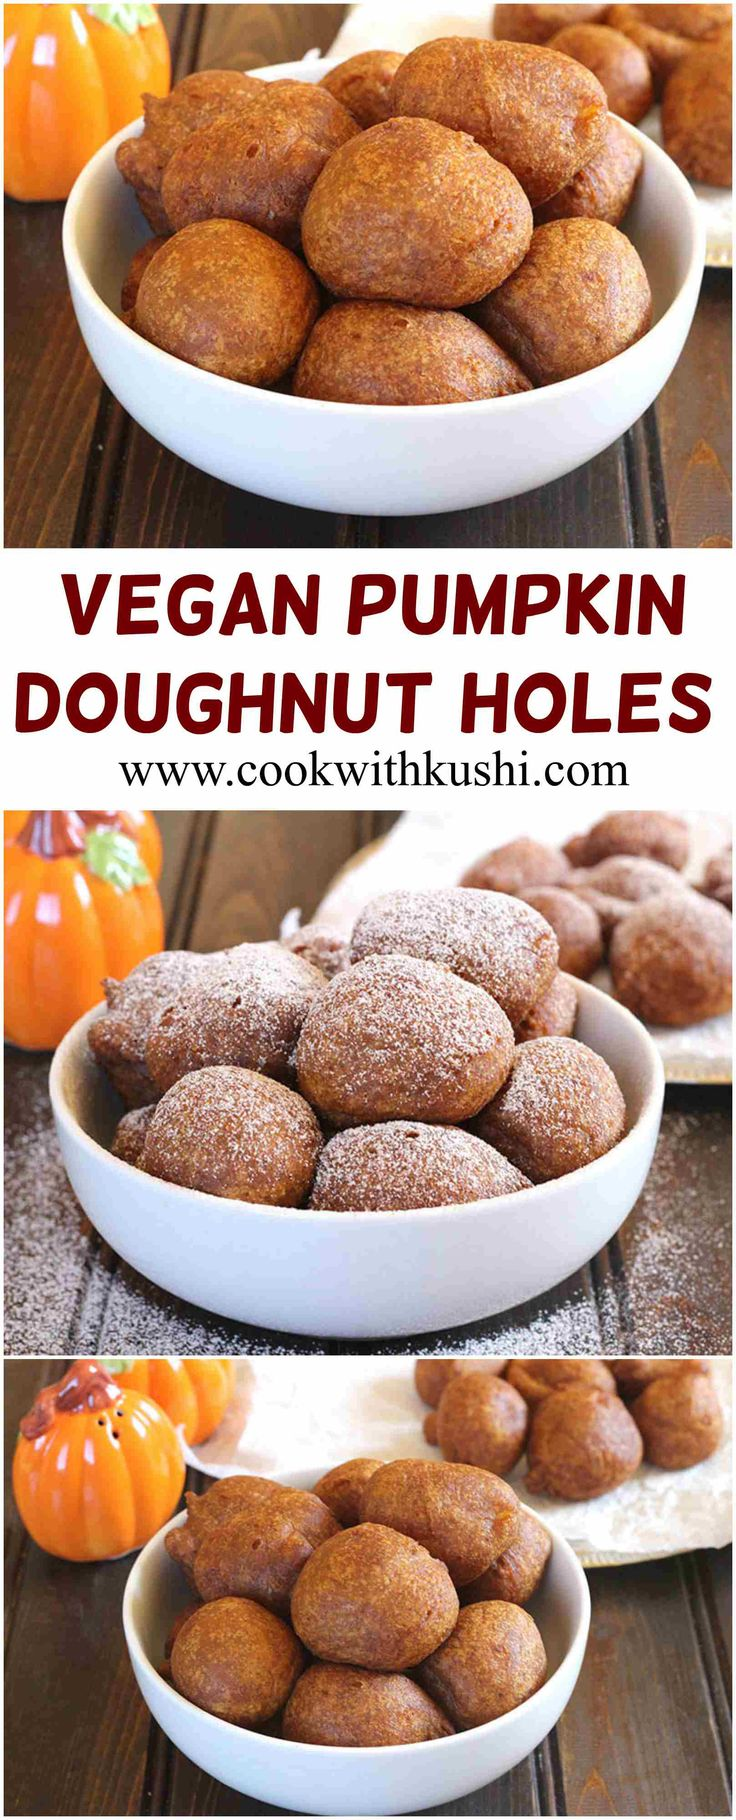 Easy vegan appetizers recipes